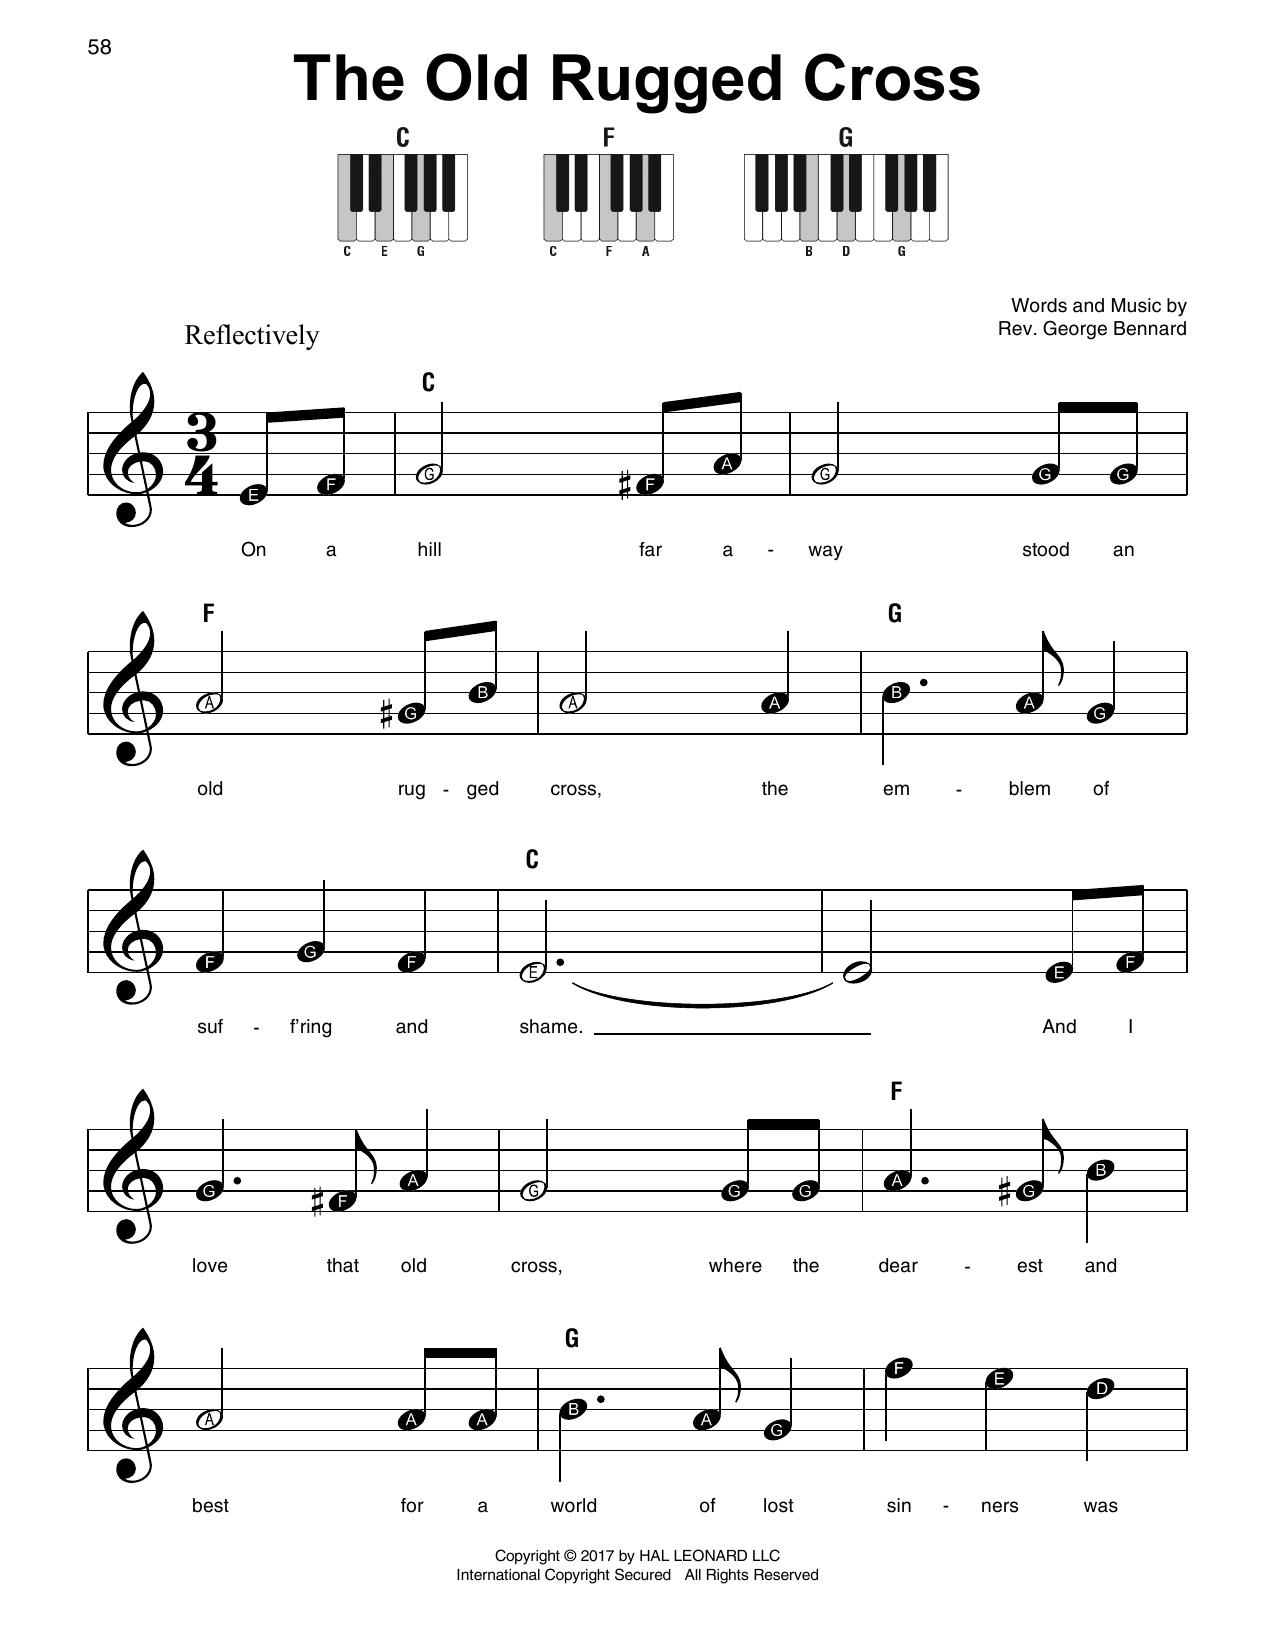 Old Rugged Cross Piano Sheet Music With Lyrics